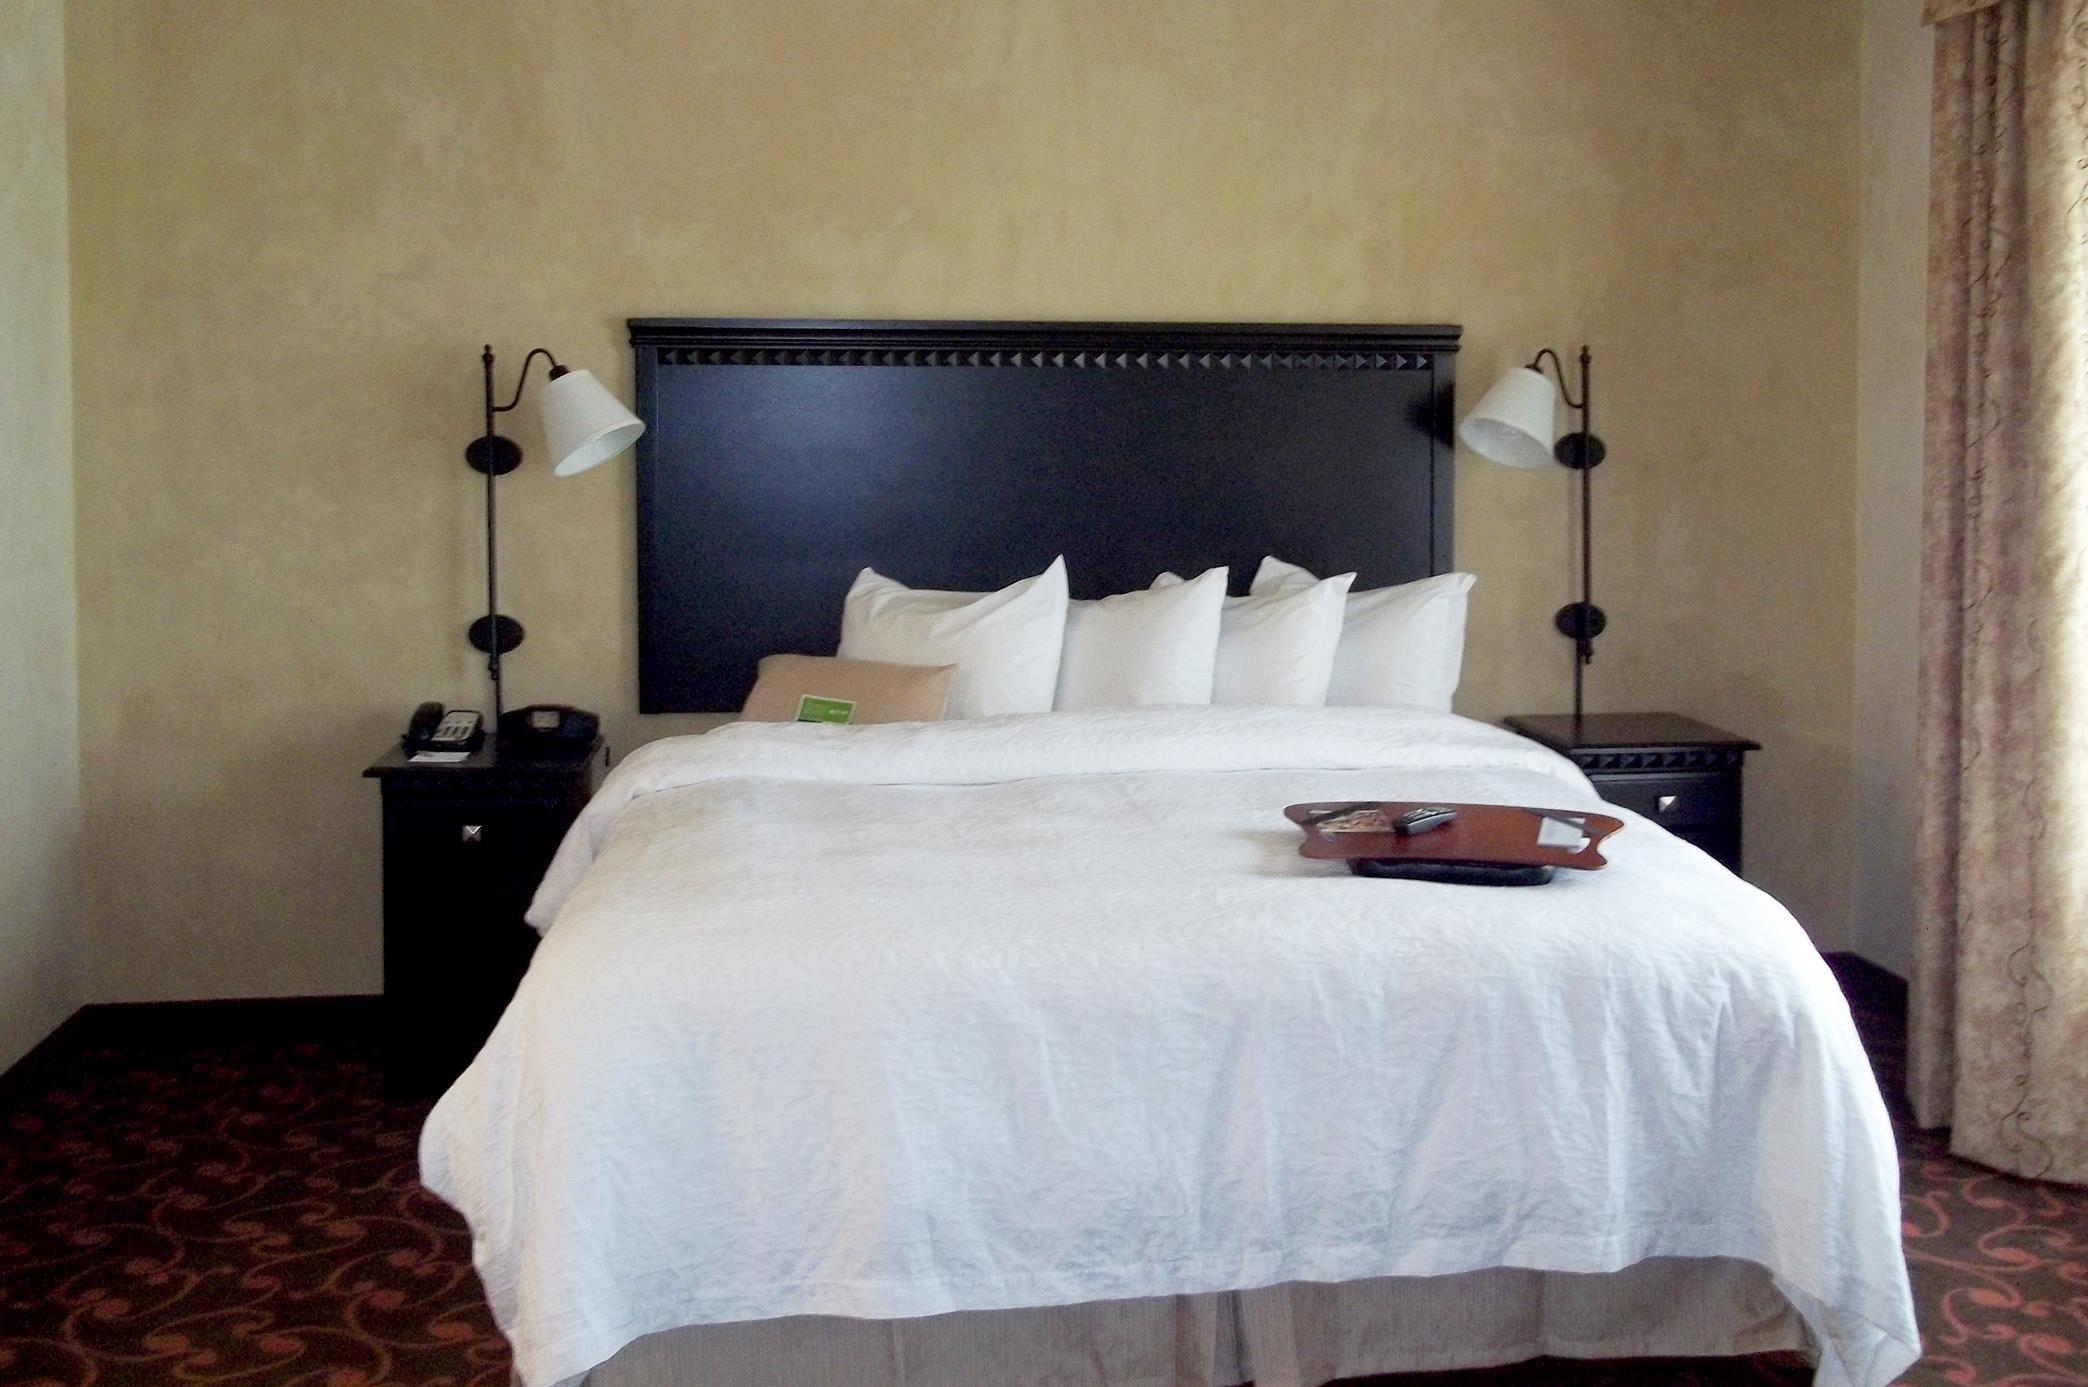 Hampton Inn & Suites Dallas-Arlington North-Entertainment District image 6